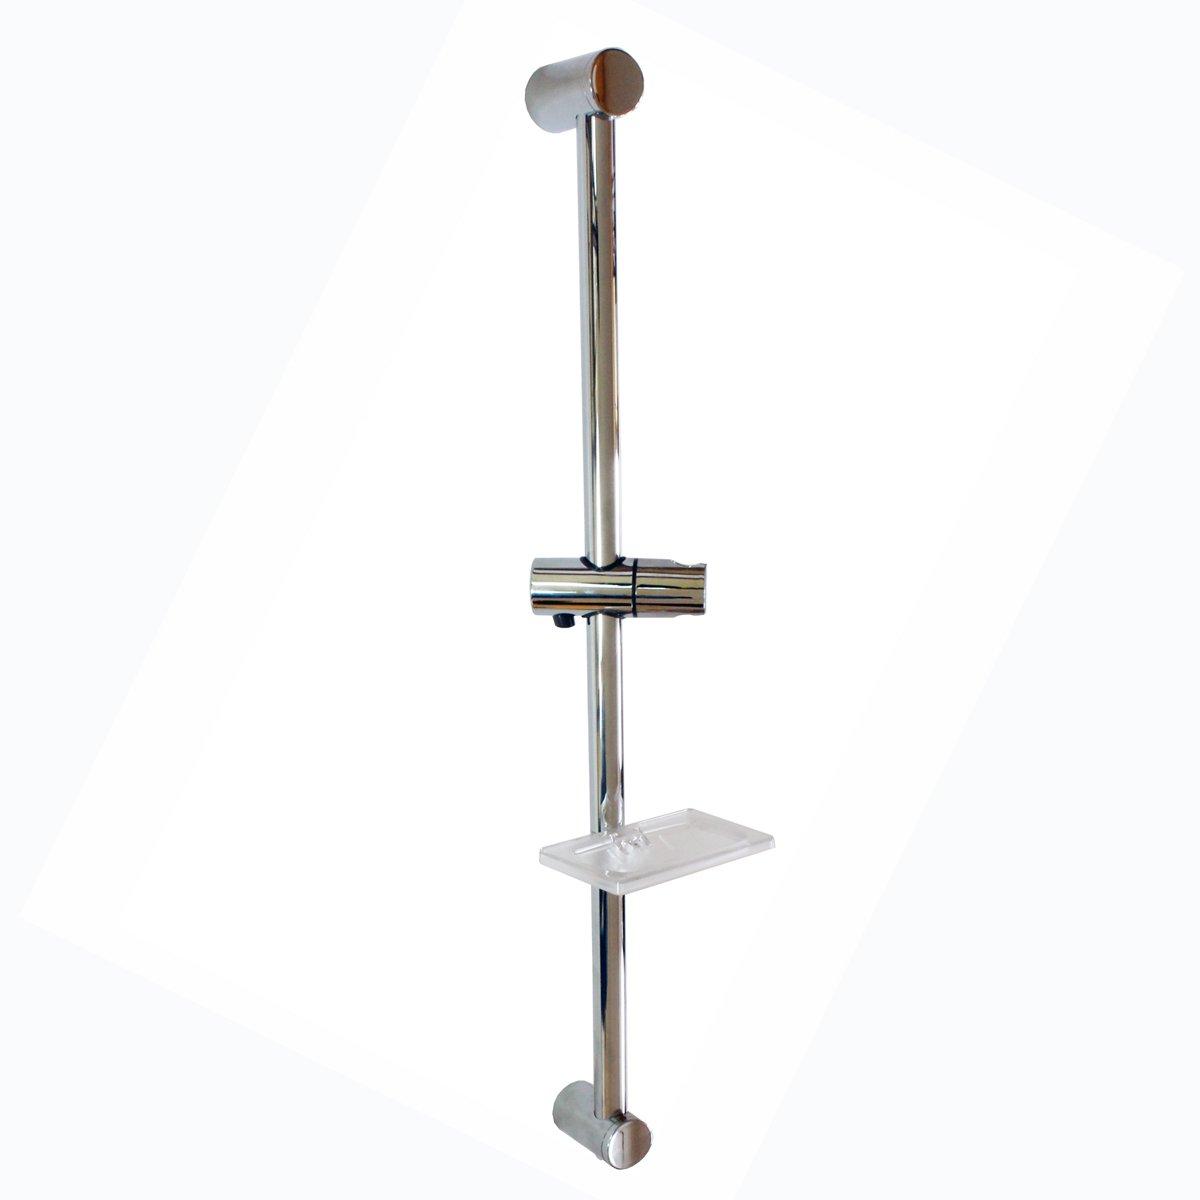 Sanixa Telescopic Shower Bar with Adjustable Bracket Shower Head Holder And Soap Dish/Bar Chrome-Plated Brass/Hold ABS Chrome Shower Rail Shower